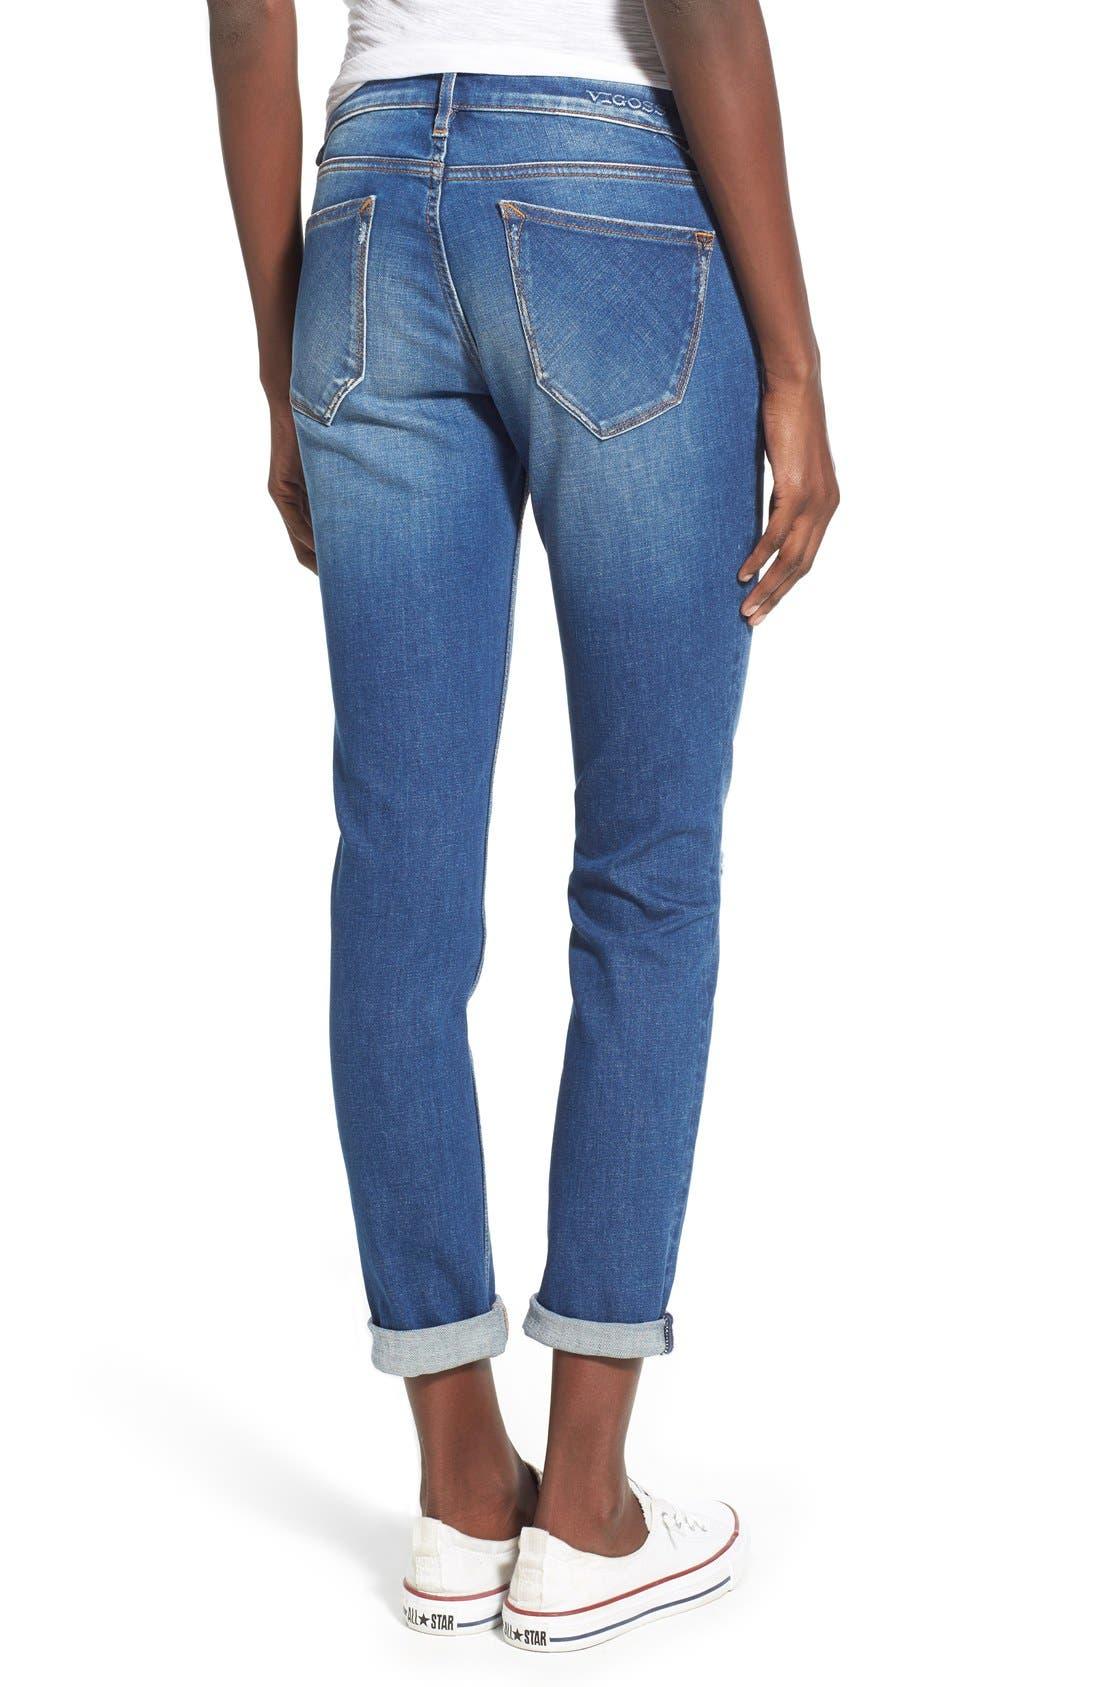 Alternate Image 2  - Vigoss 'Tomboy Thompson' Destructed Jeans (Medium Wash)